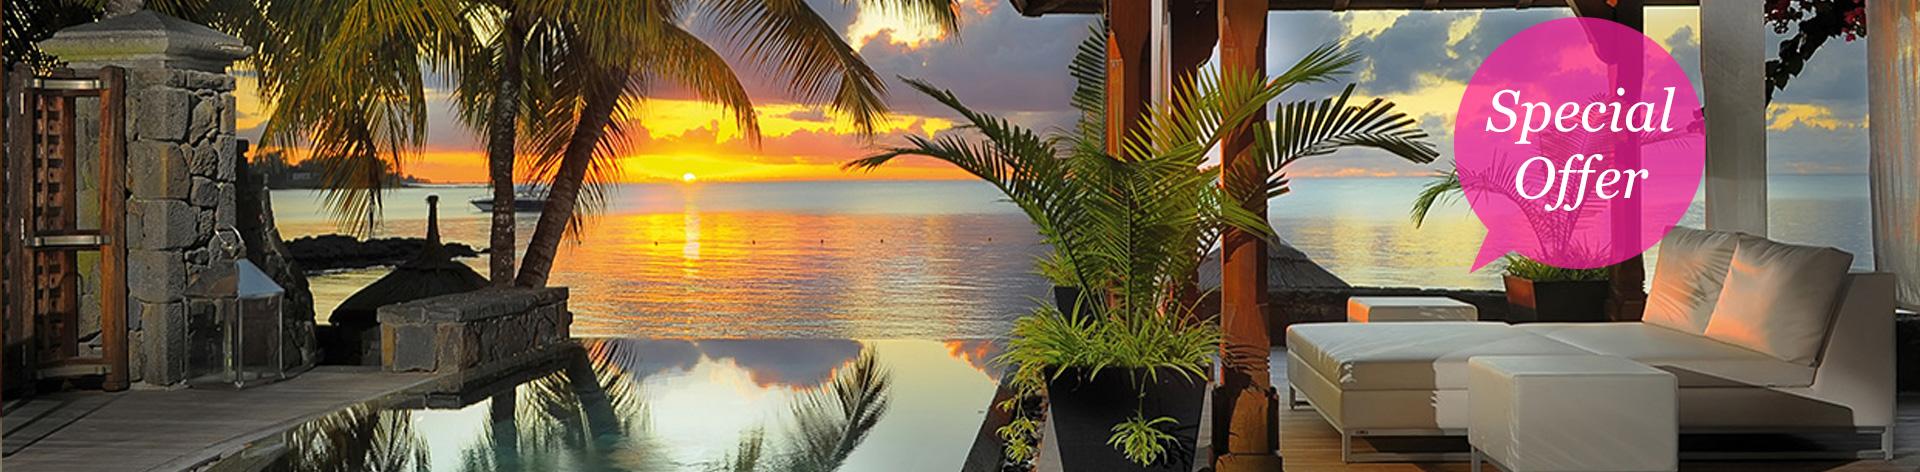 20% rabatt - royal palm Mauritius